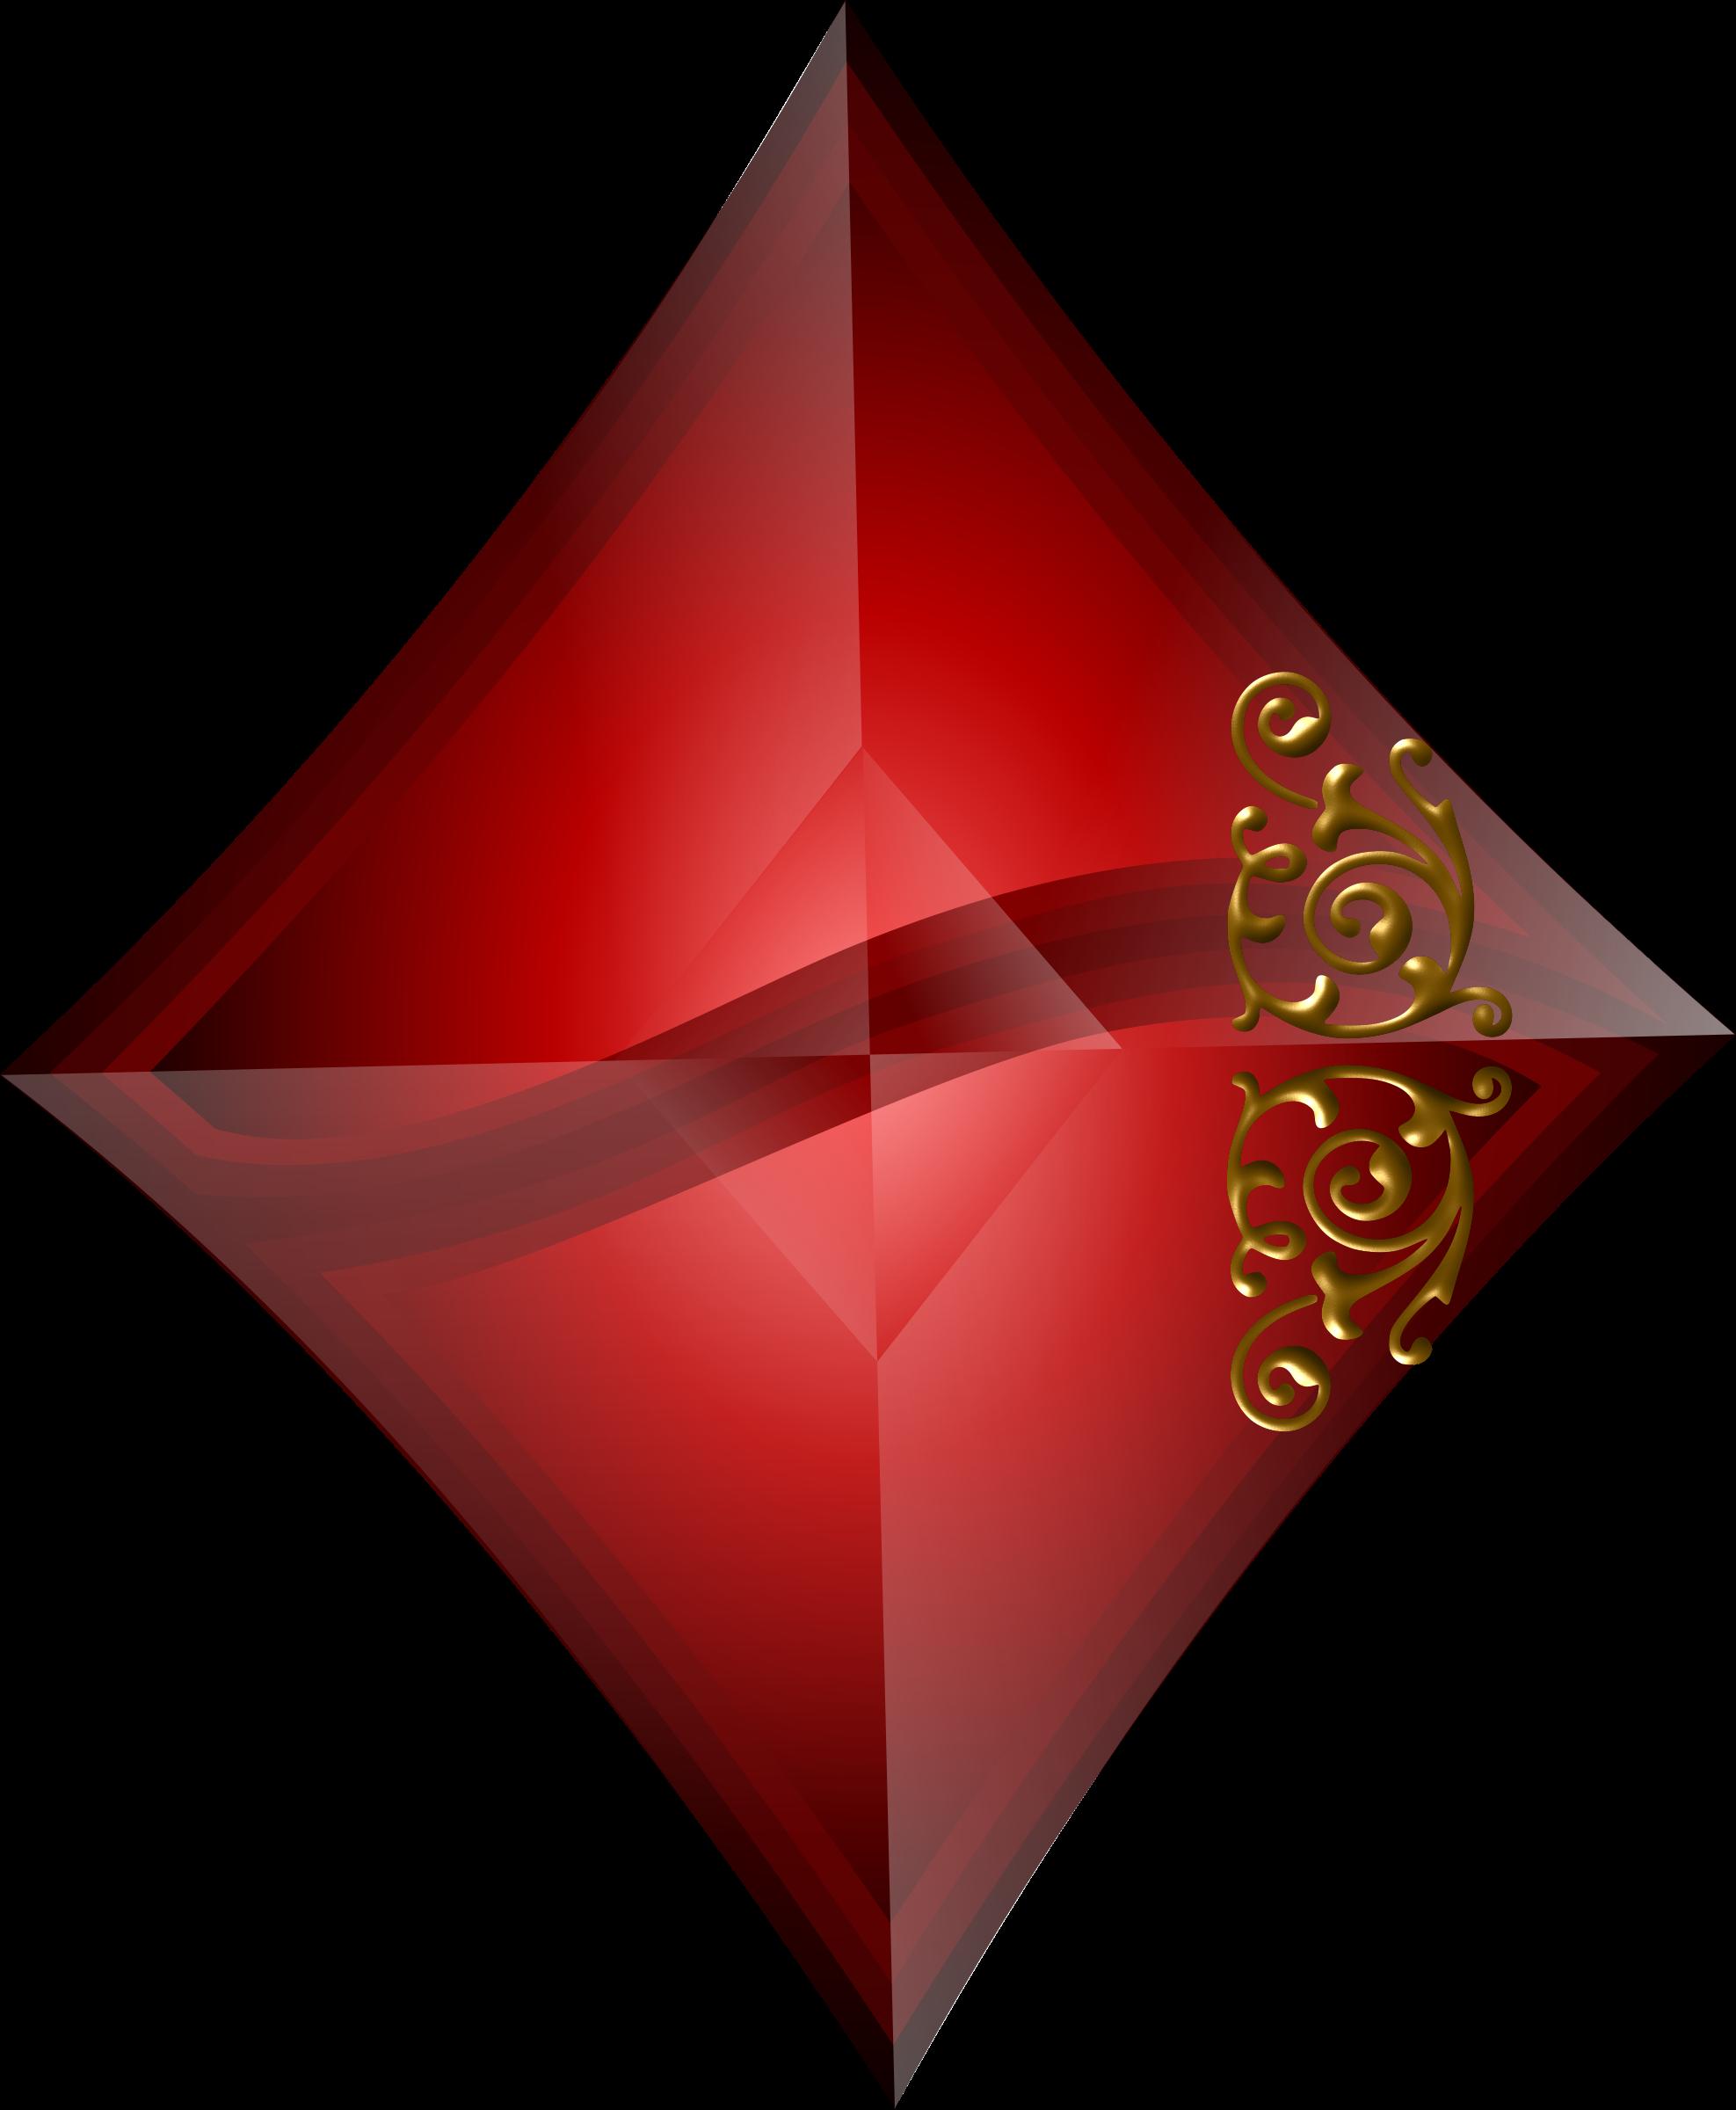 Diamonds big image png. Clipart diamond symbol